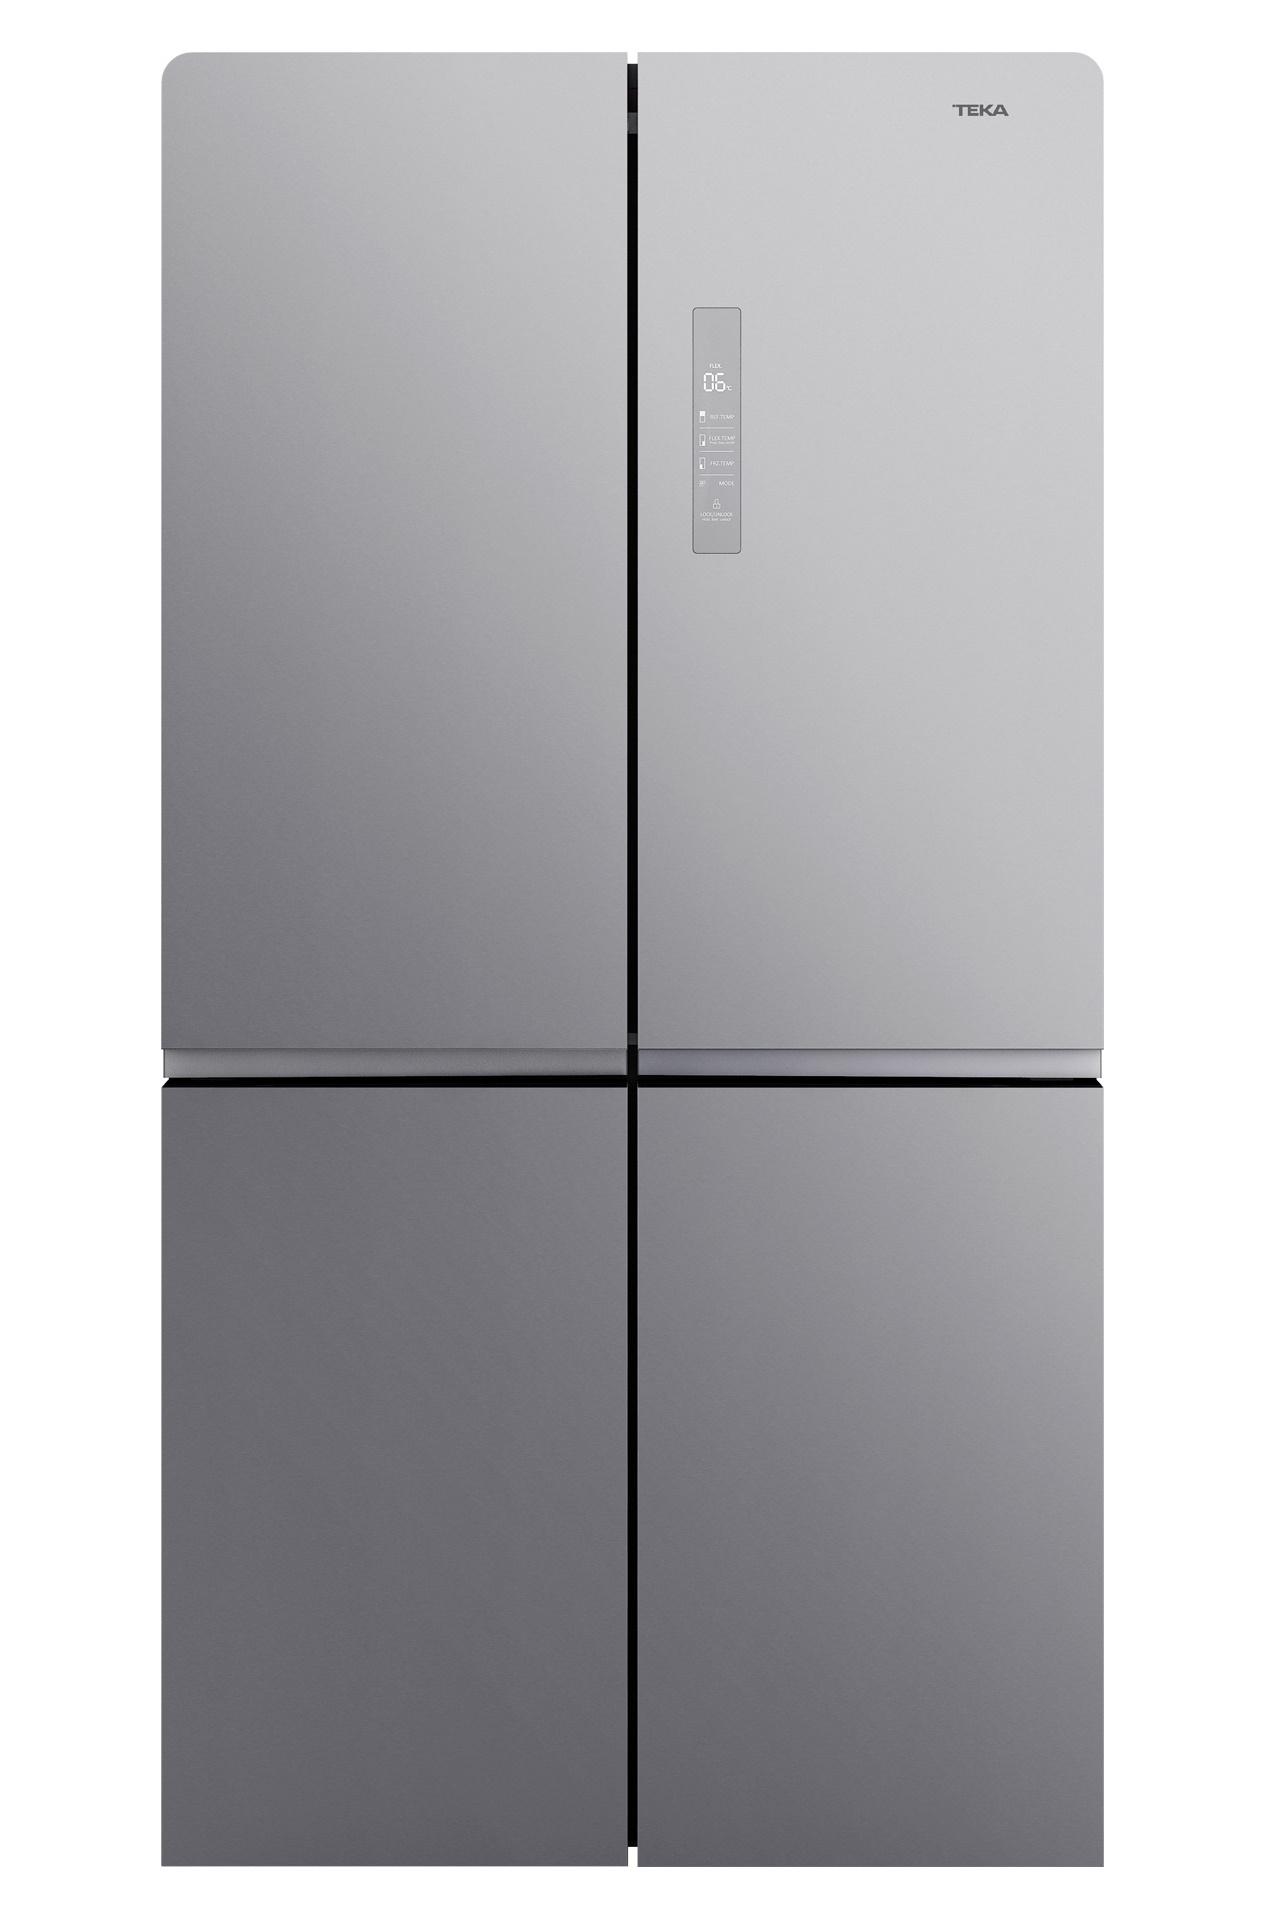 Combina frigorifica cu 4 usi Teka Maestro RMF 77920 SS LongLife No Frost IonClean 637 litri net clasa A++ inox poza